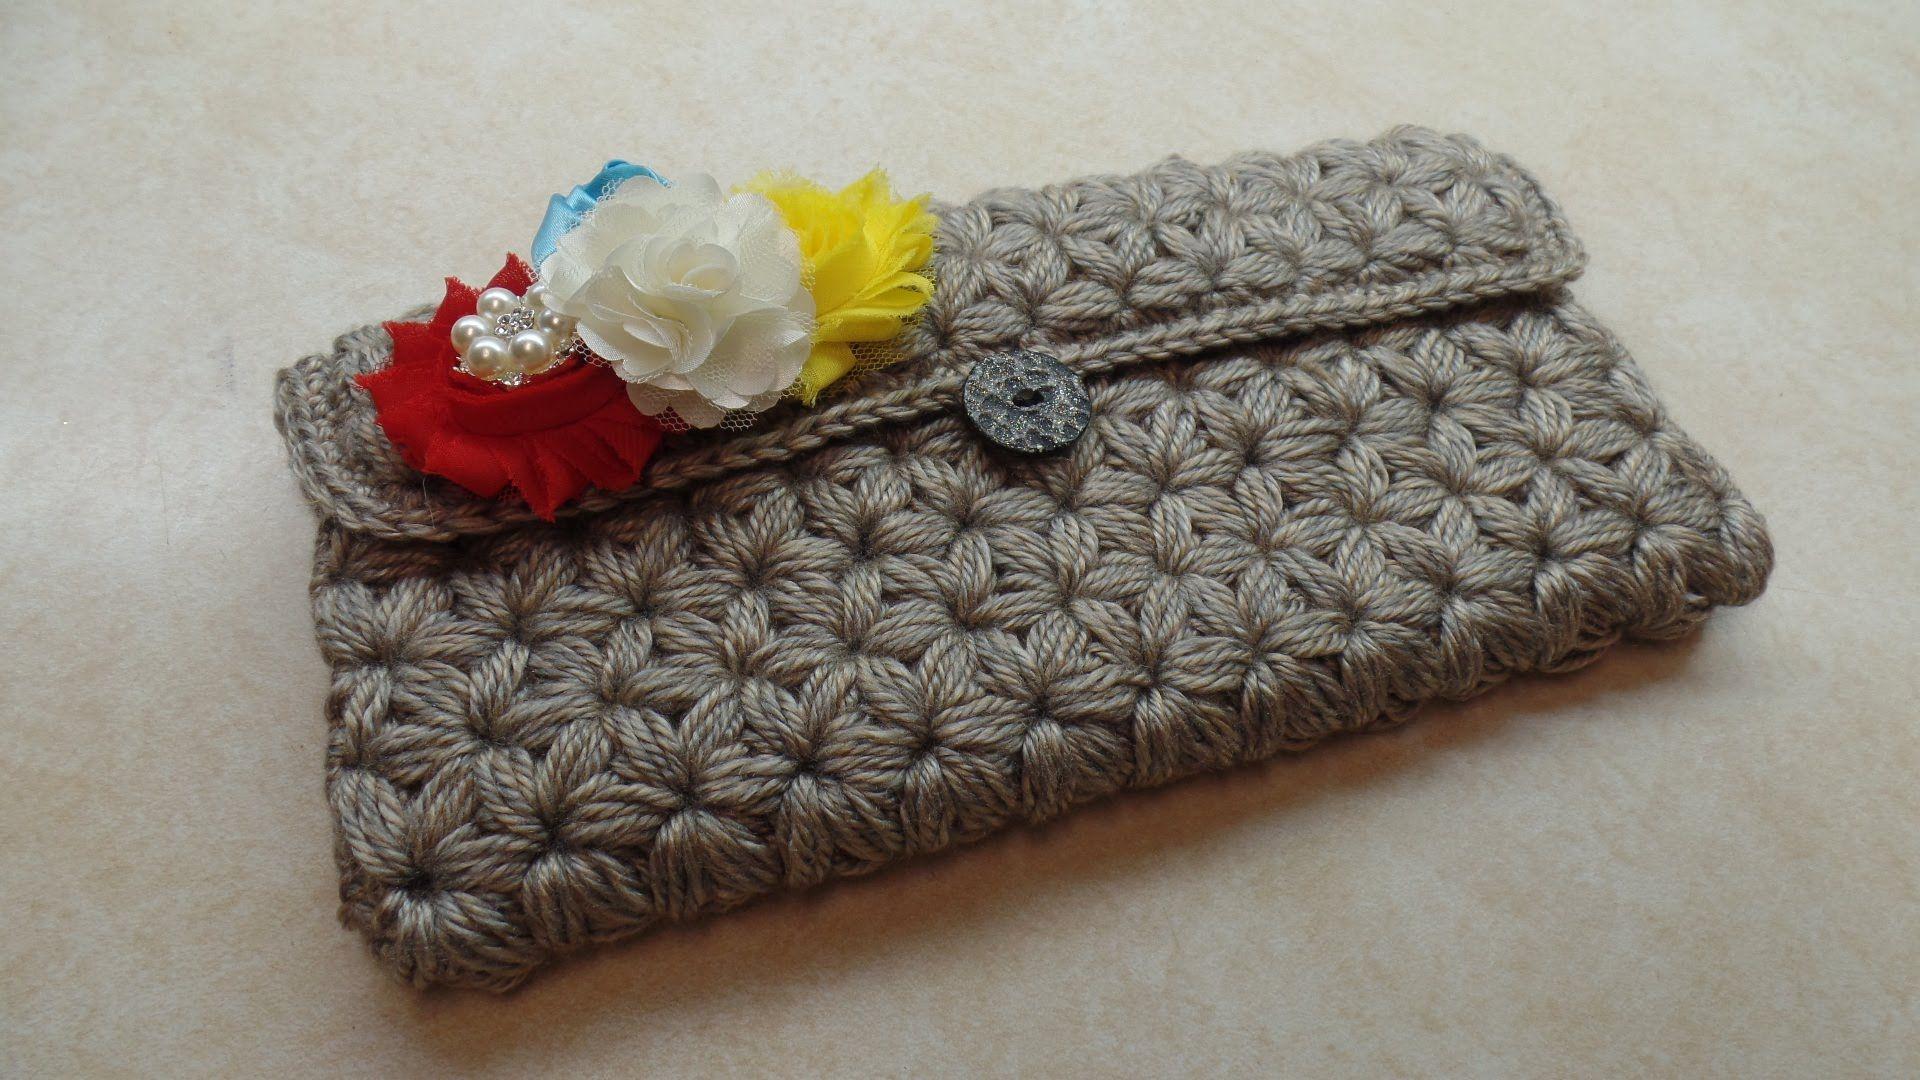 How To Crochet Puffed Star Stitch Clutch Wallet Purse